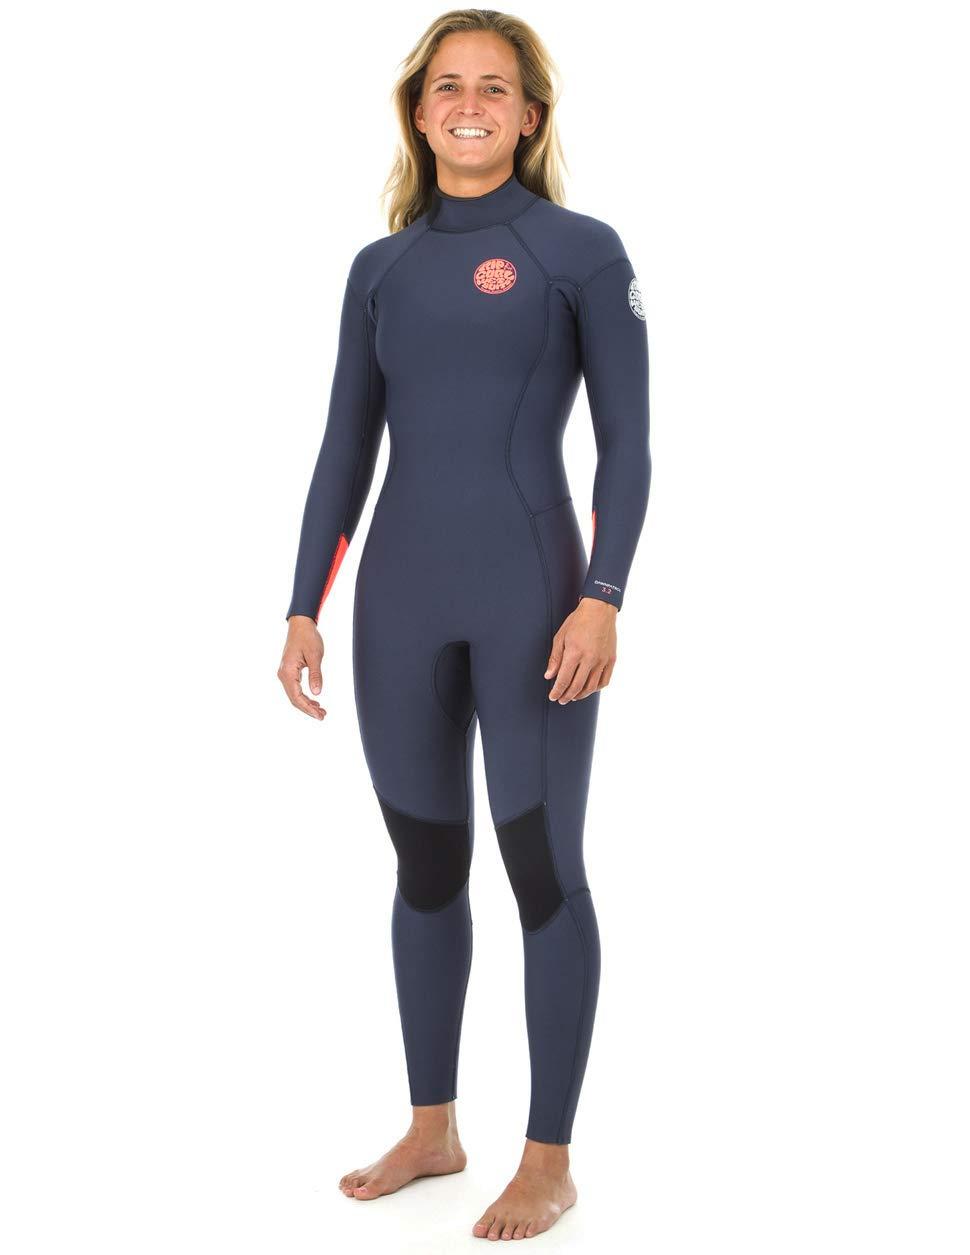 6d1567f224 Amazon.com  Rip Curl Dawn Patrol 4 3 mm Back Zip Wetsuit - Women s - Navy   Sports   Outdoors